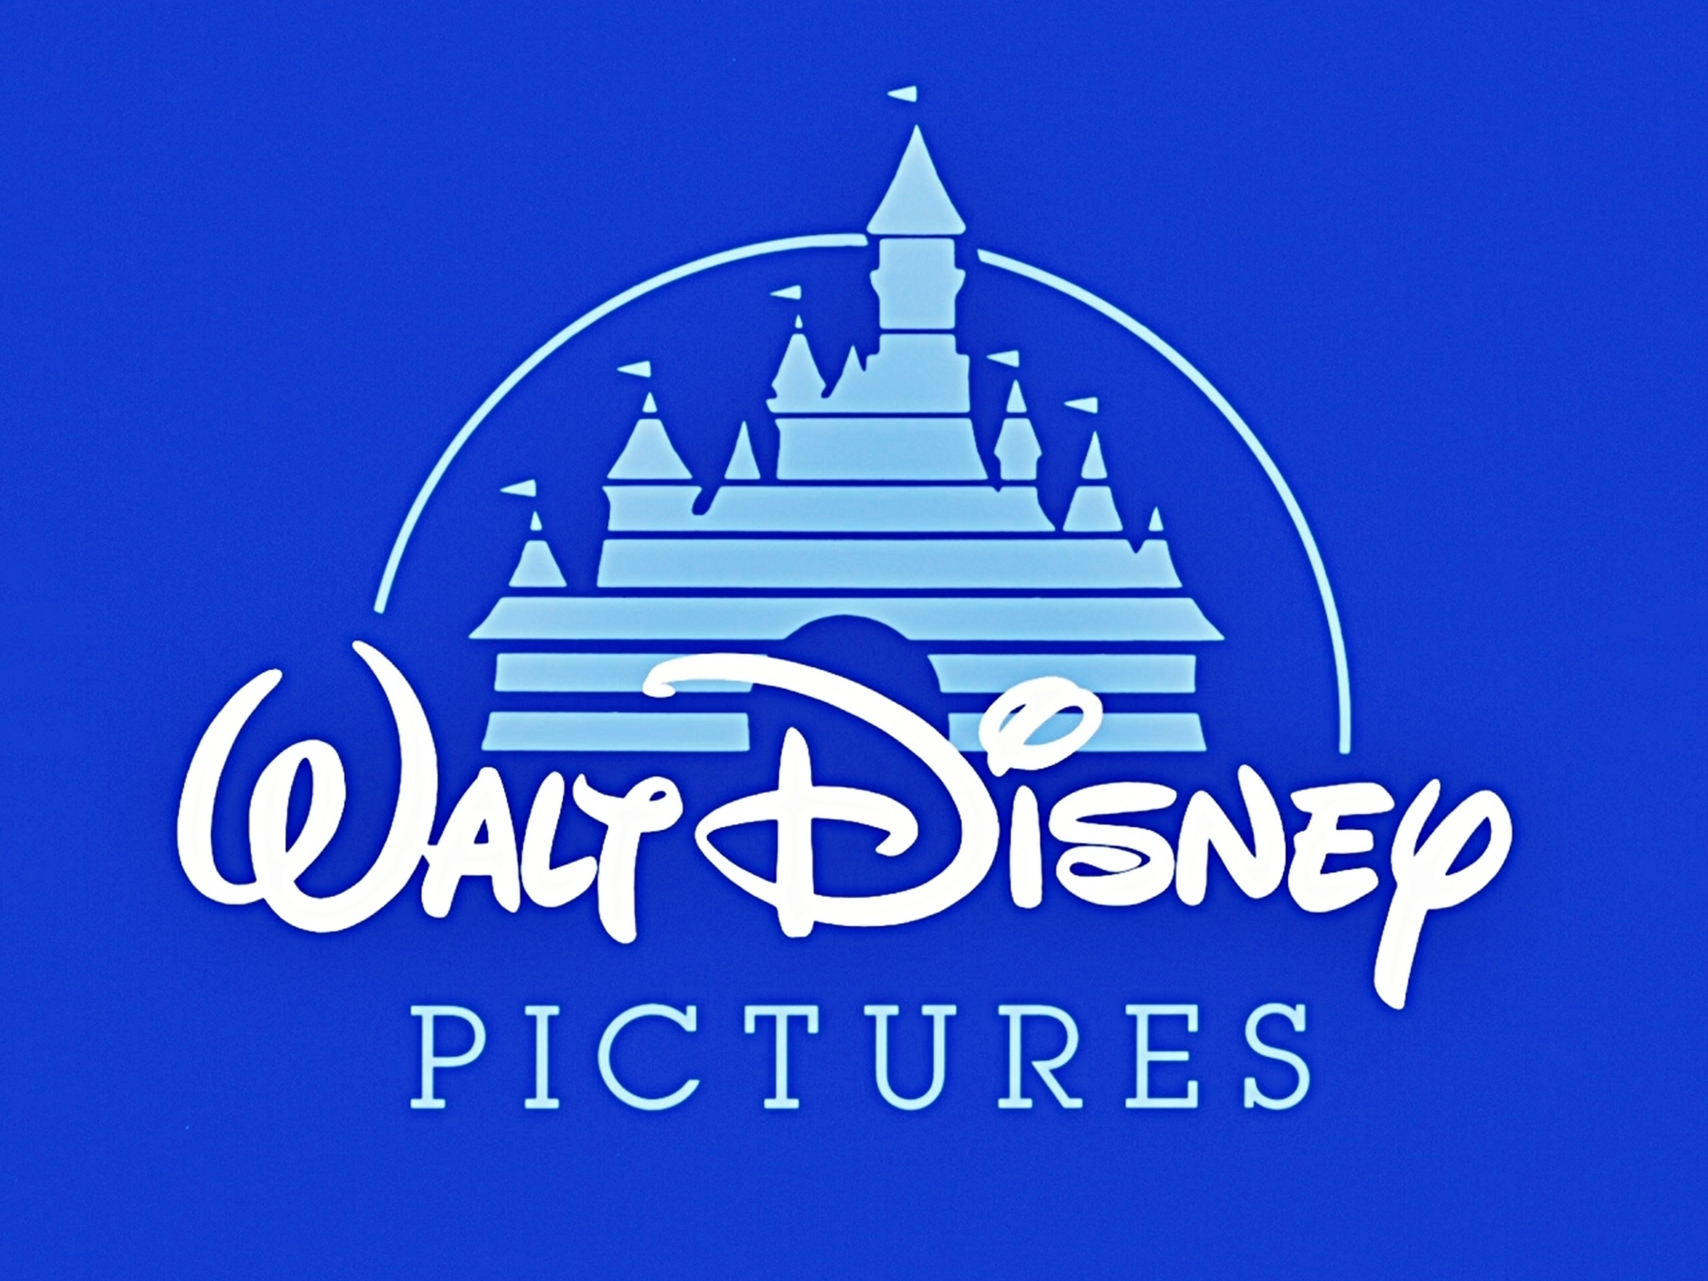 Walt disney brand Wallpaper